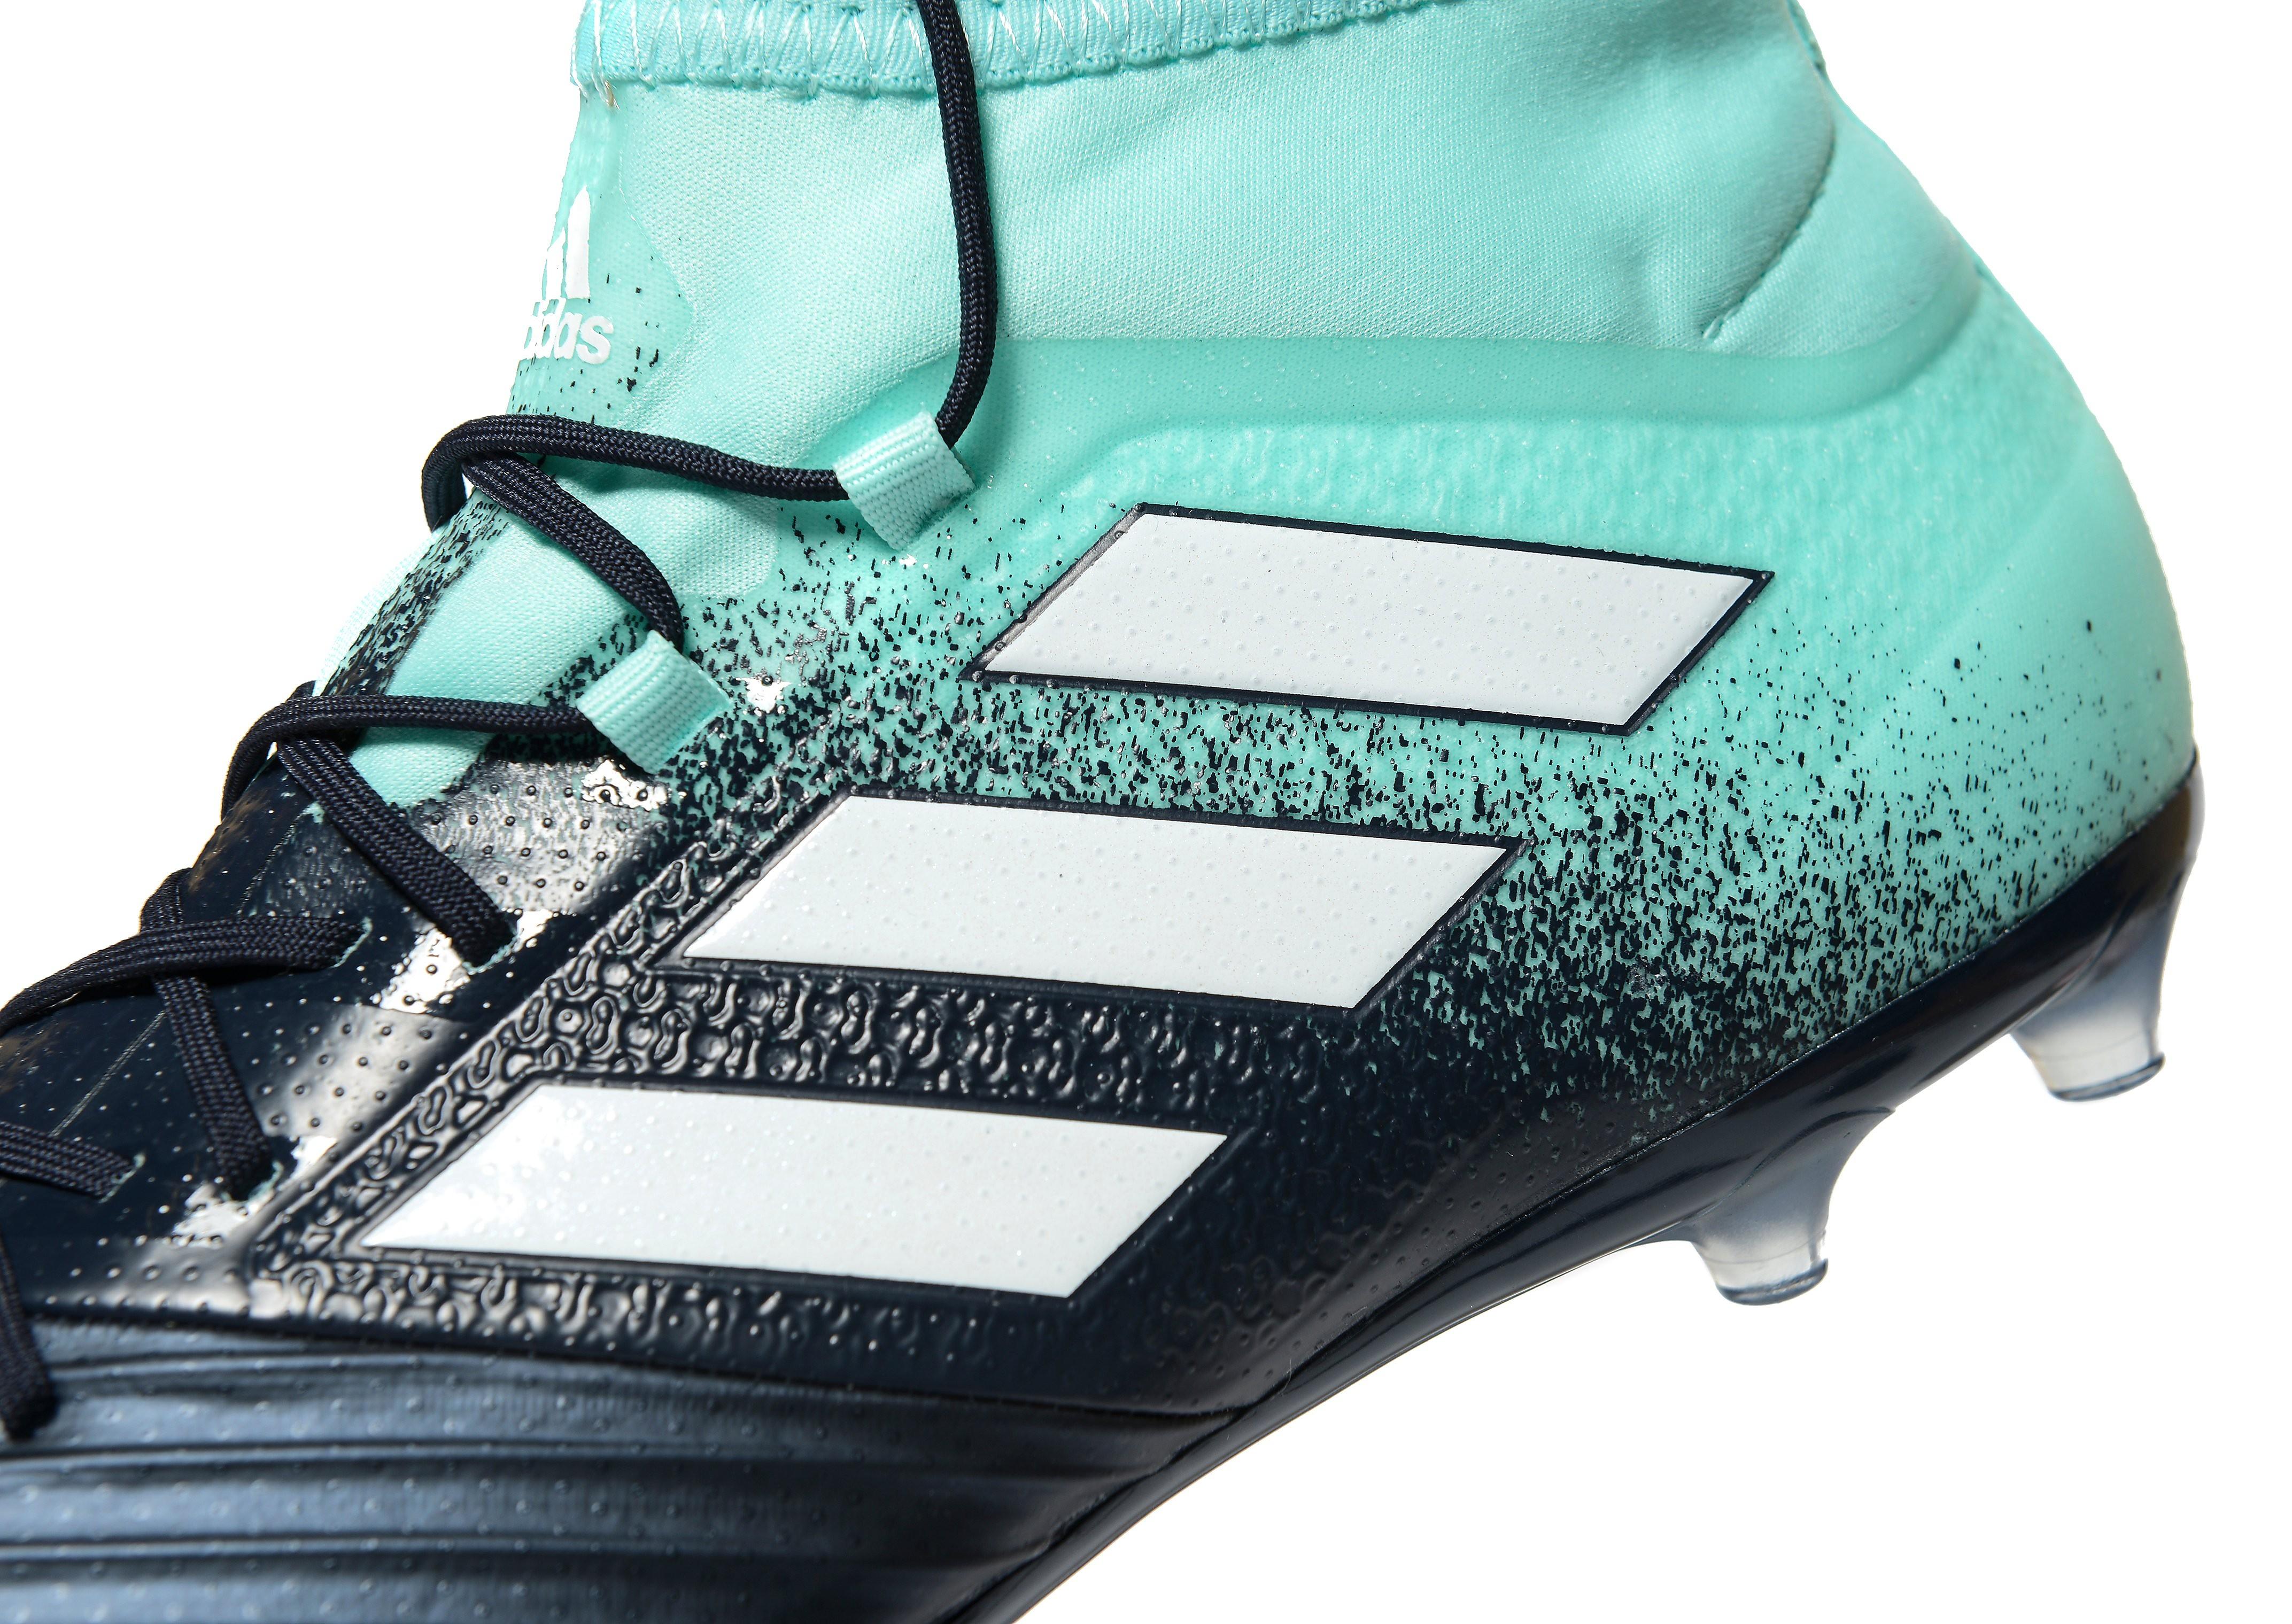 adidas Ocean Storm ACE 17.2 Primemesh FG